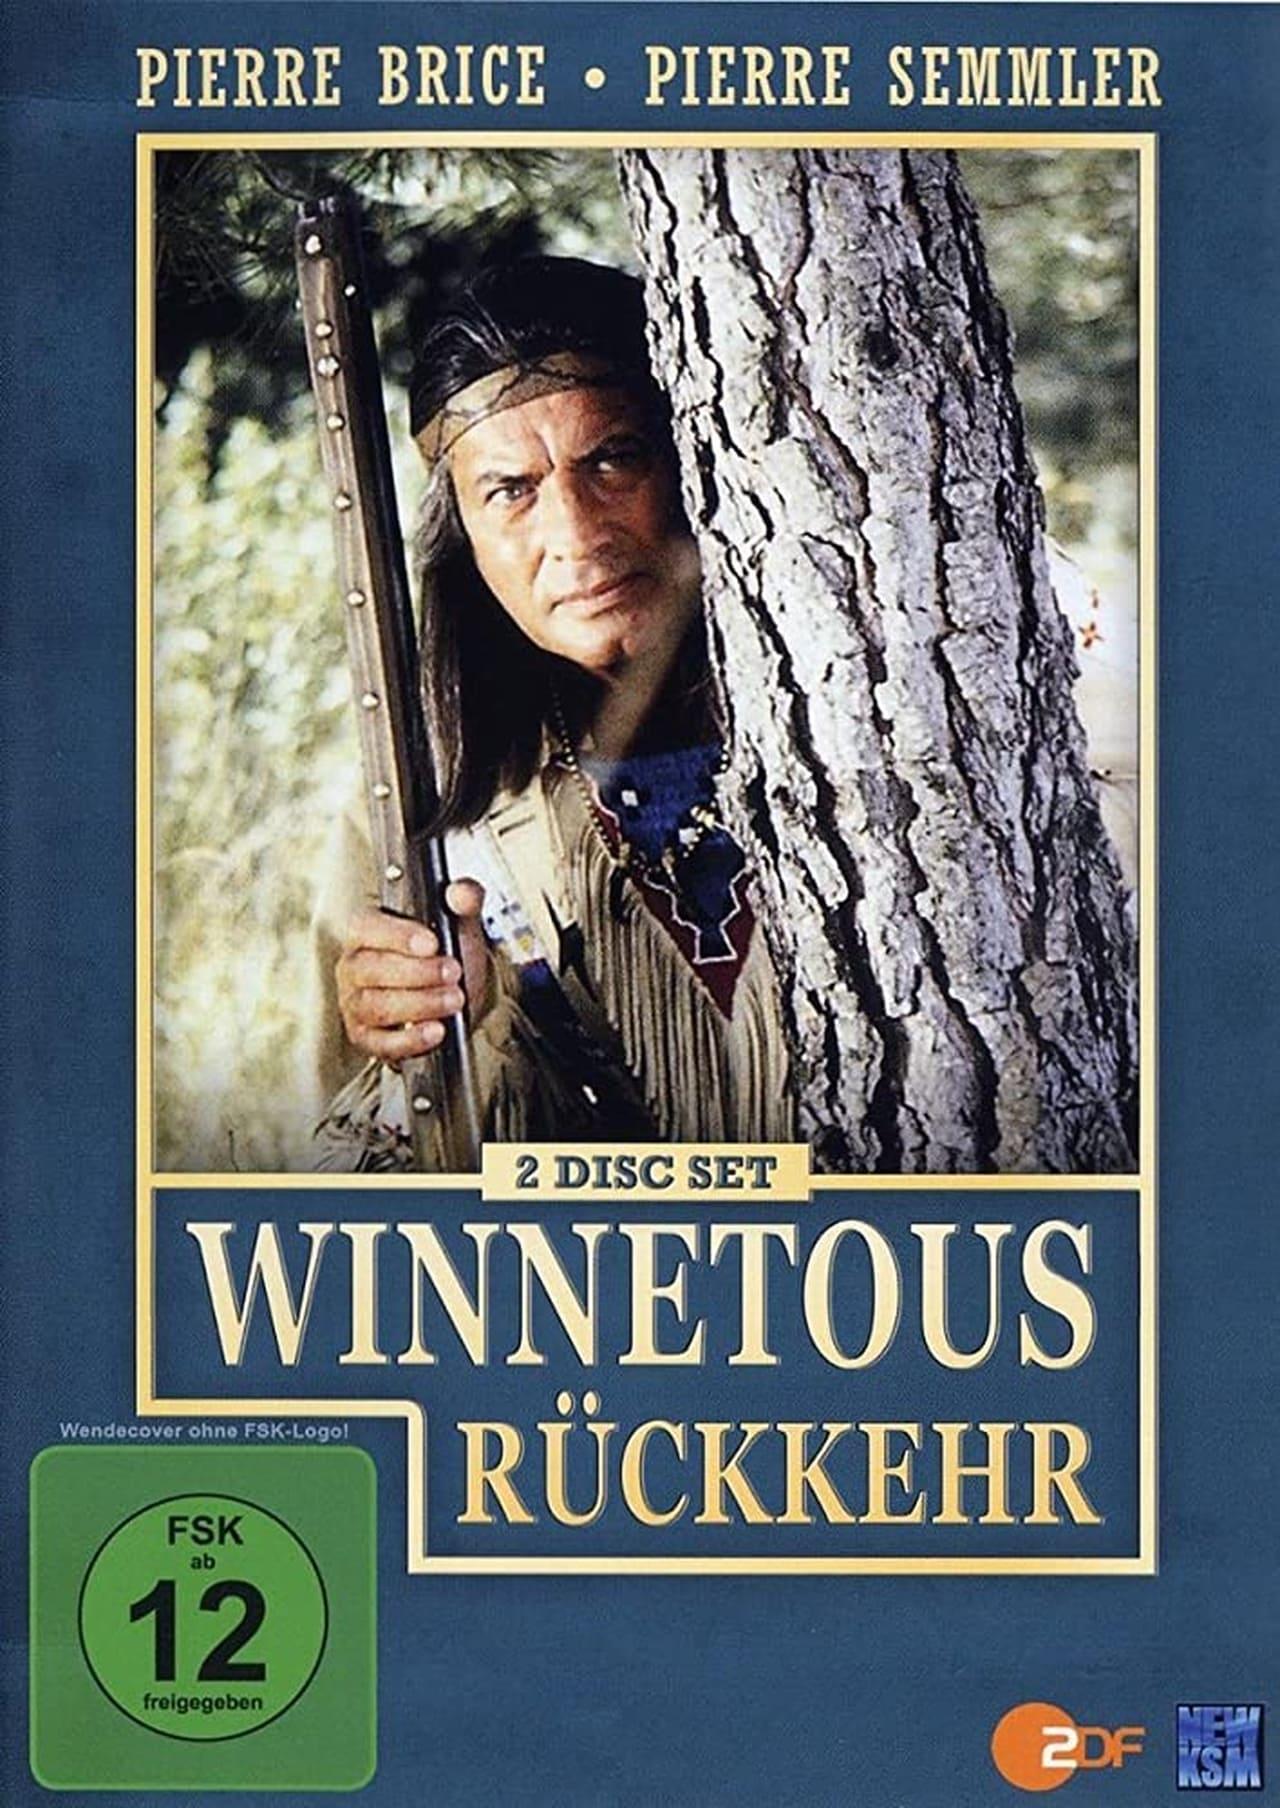 The Return of Winnetou (1998)